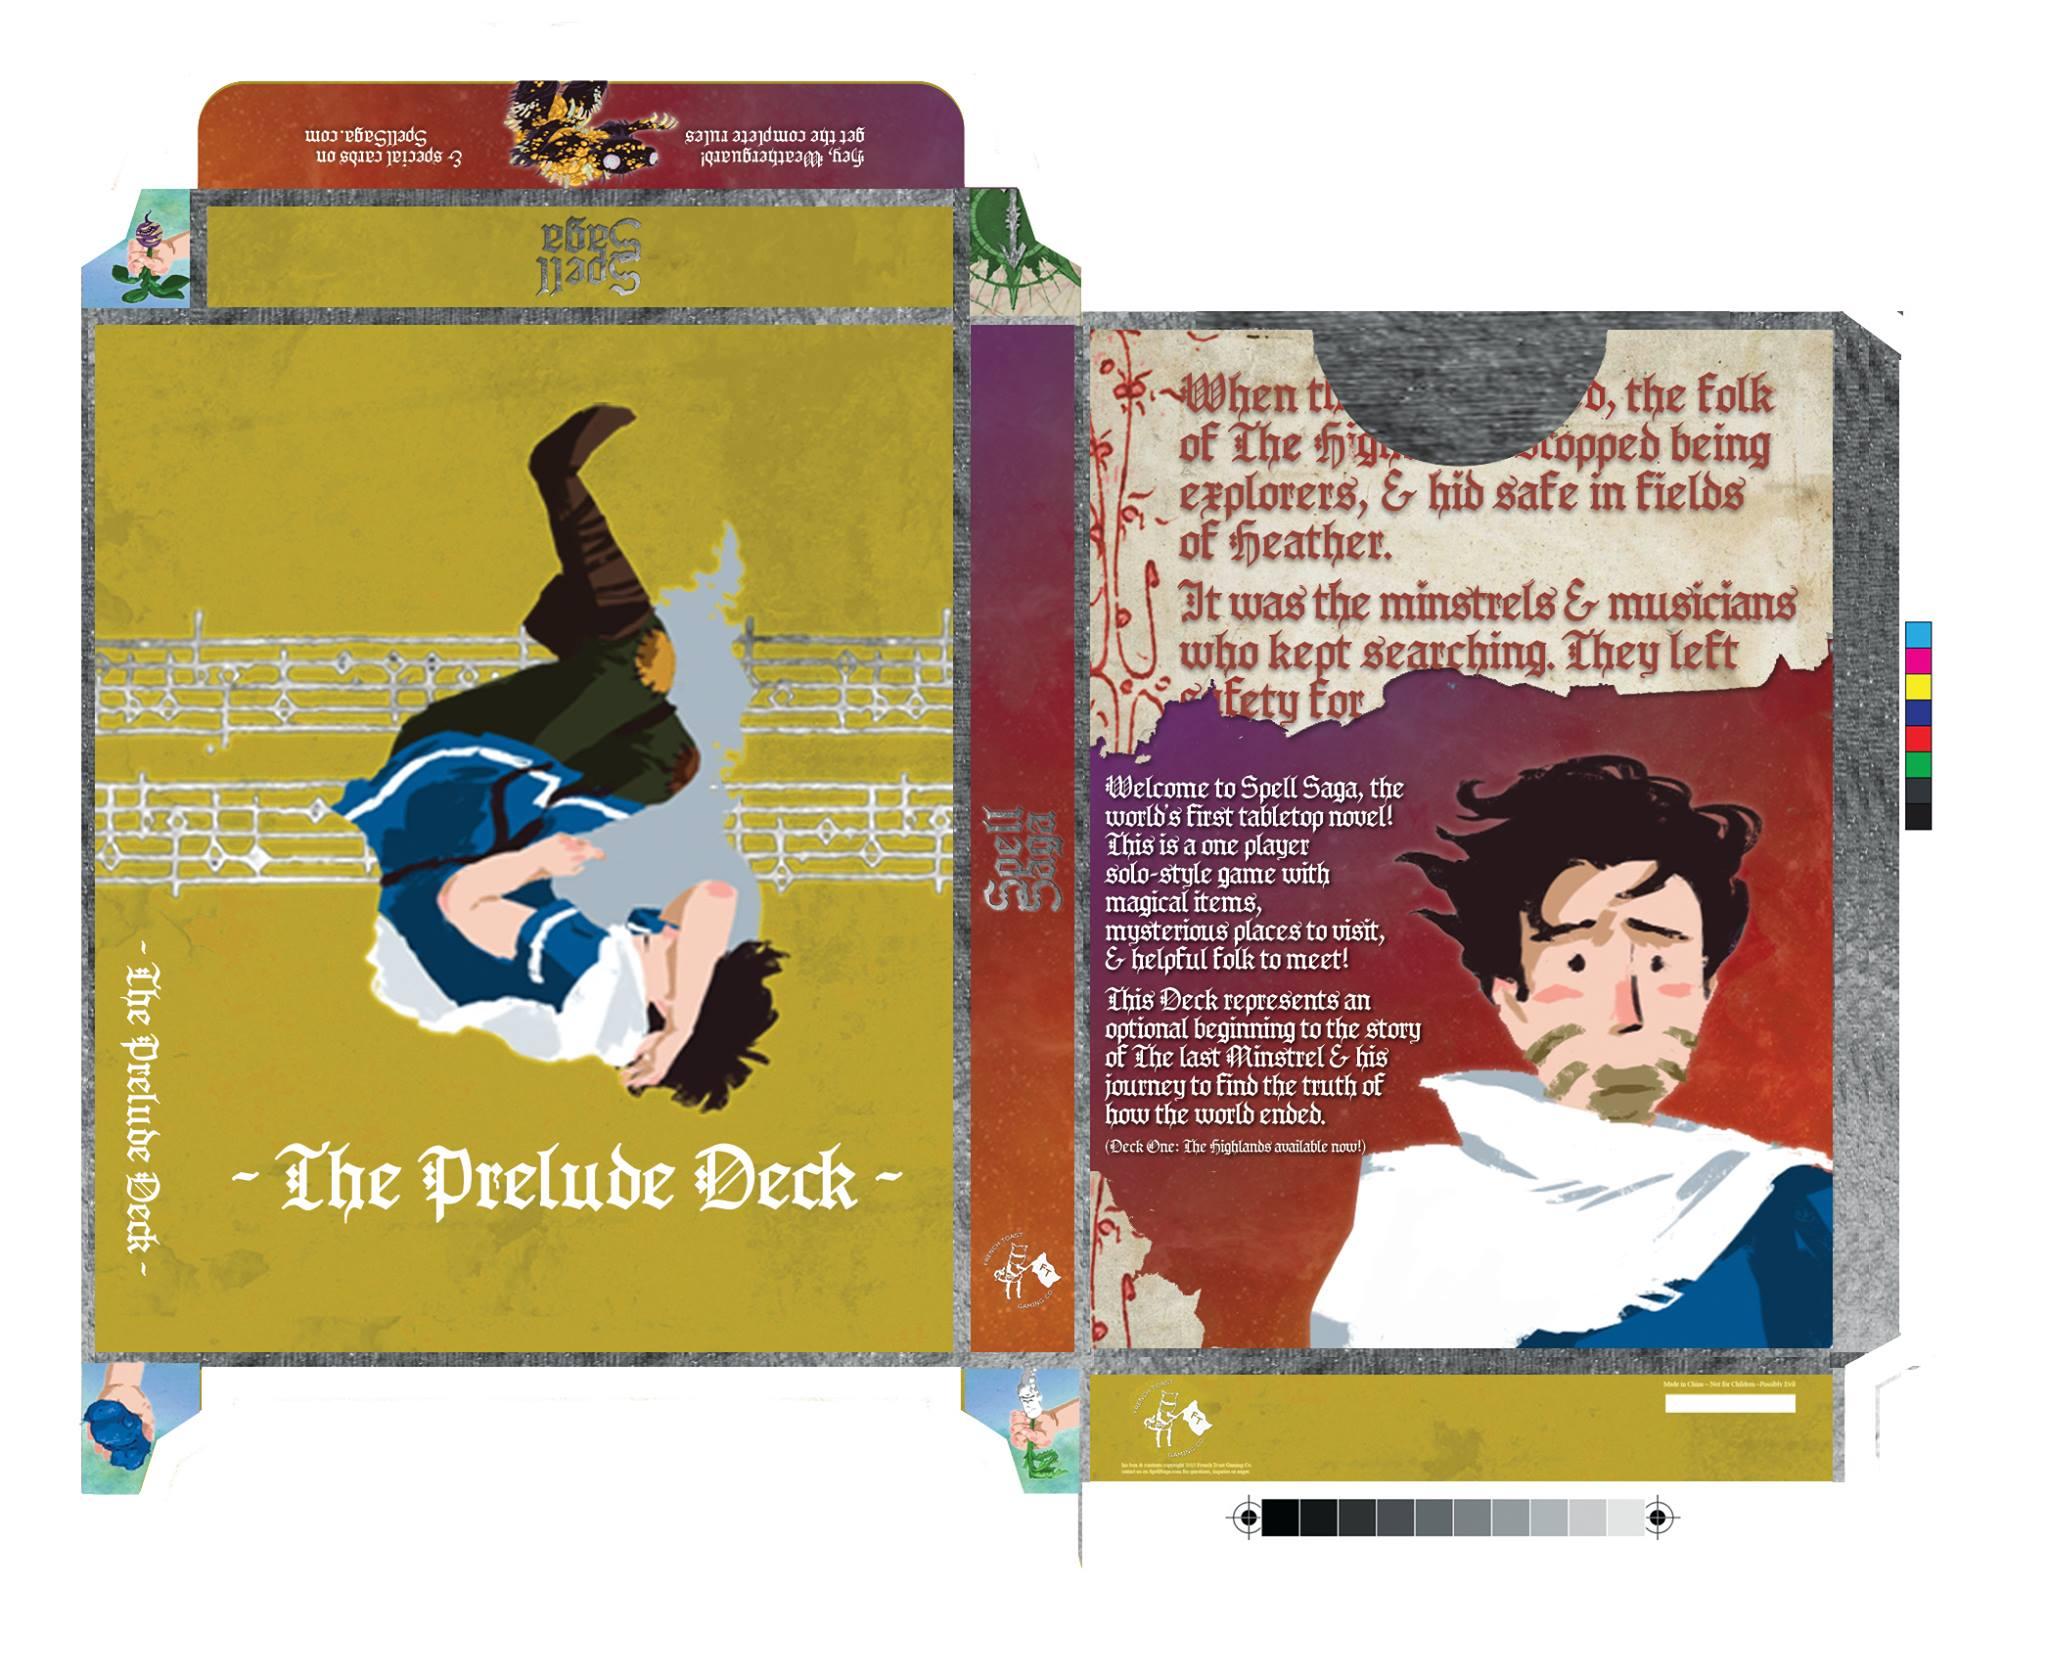 2015 original Prelude Deck packaging